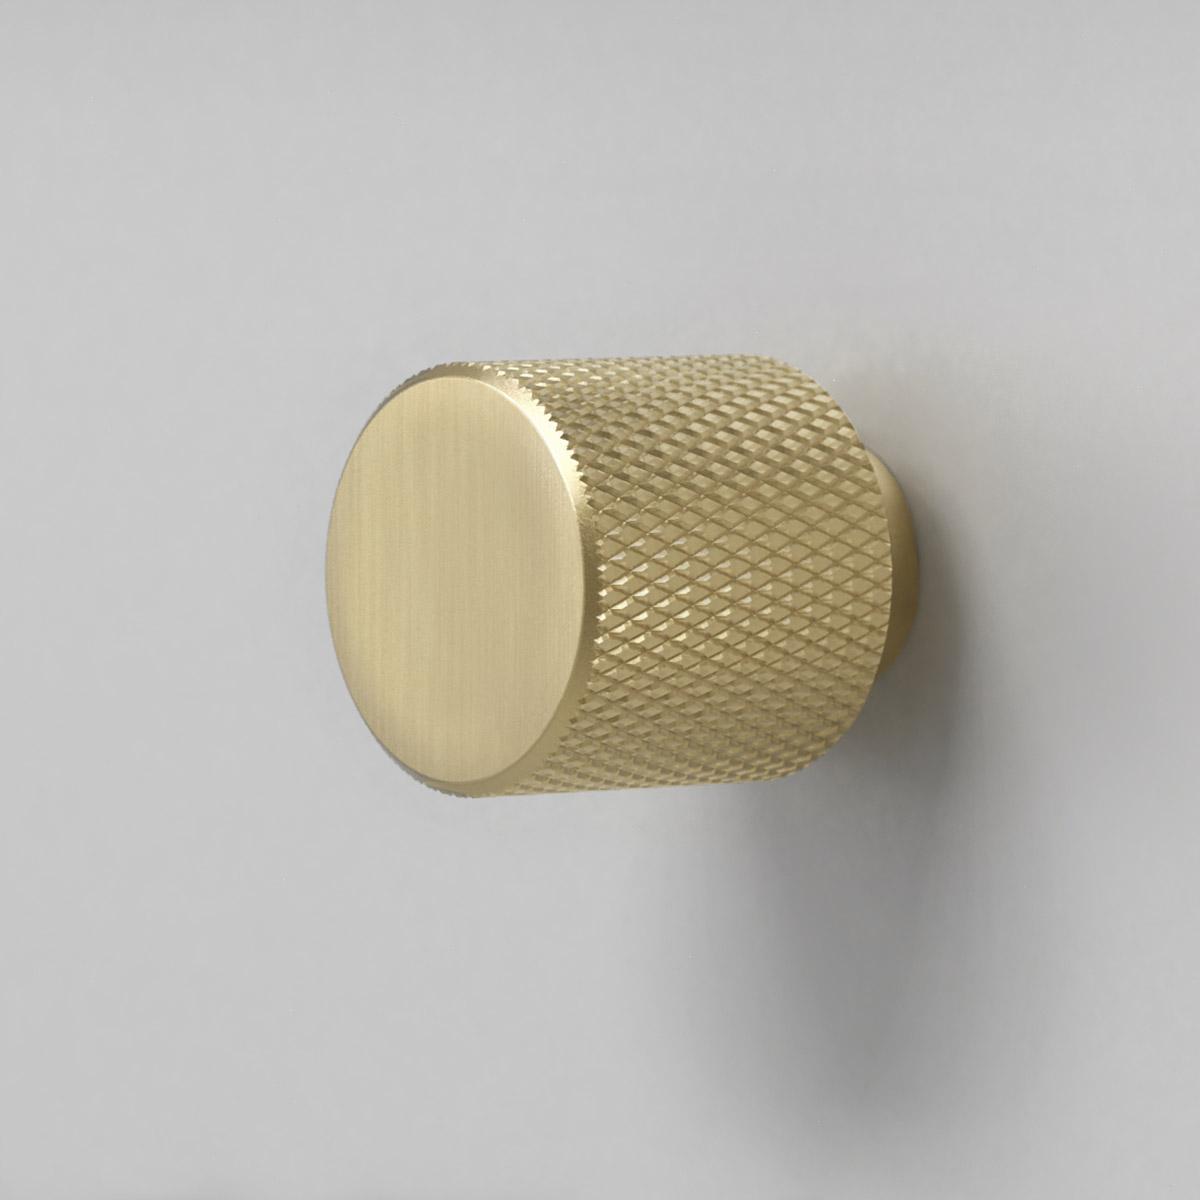 Knopp helix rmassing 309028 11 20 mm ncs s 3000 n